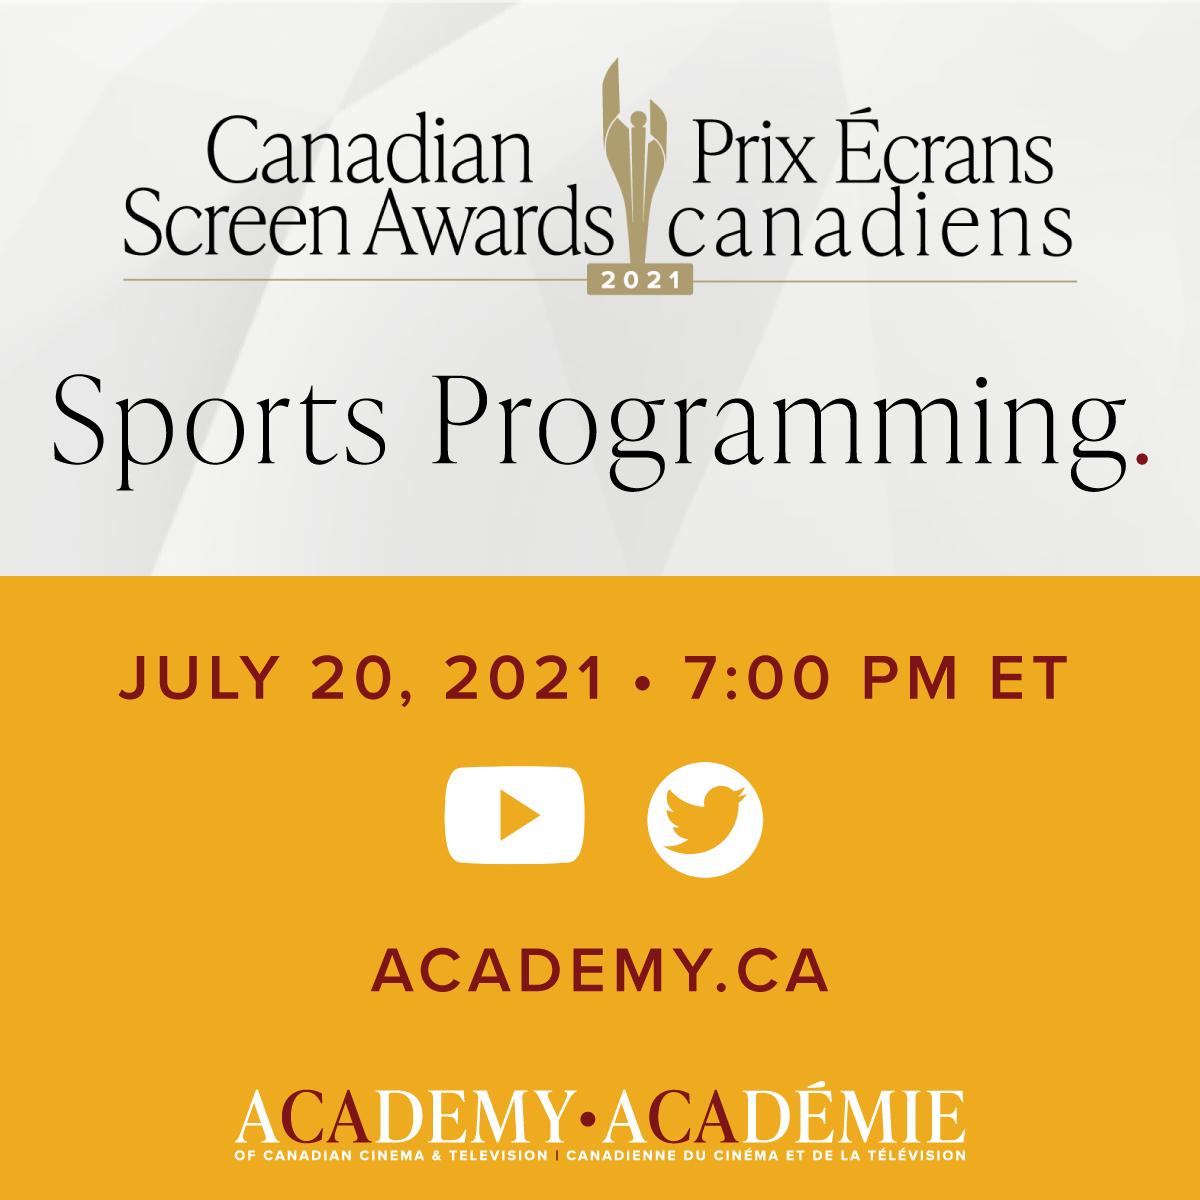 Canadian Screen Awards Sports Programming